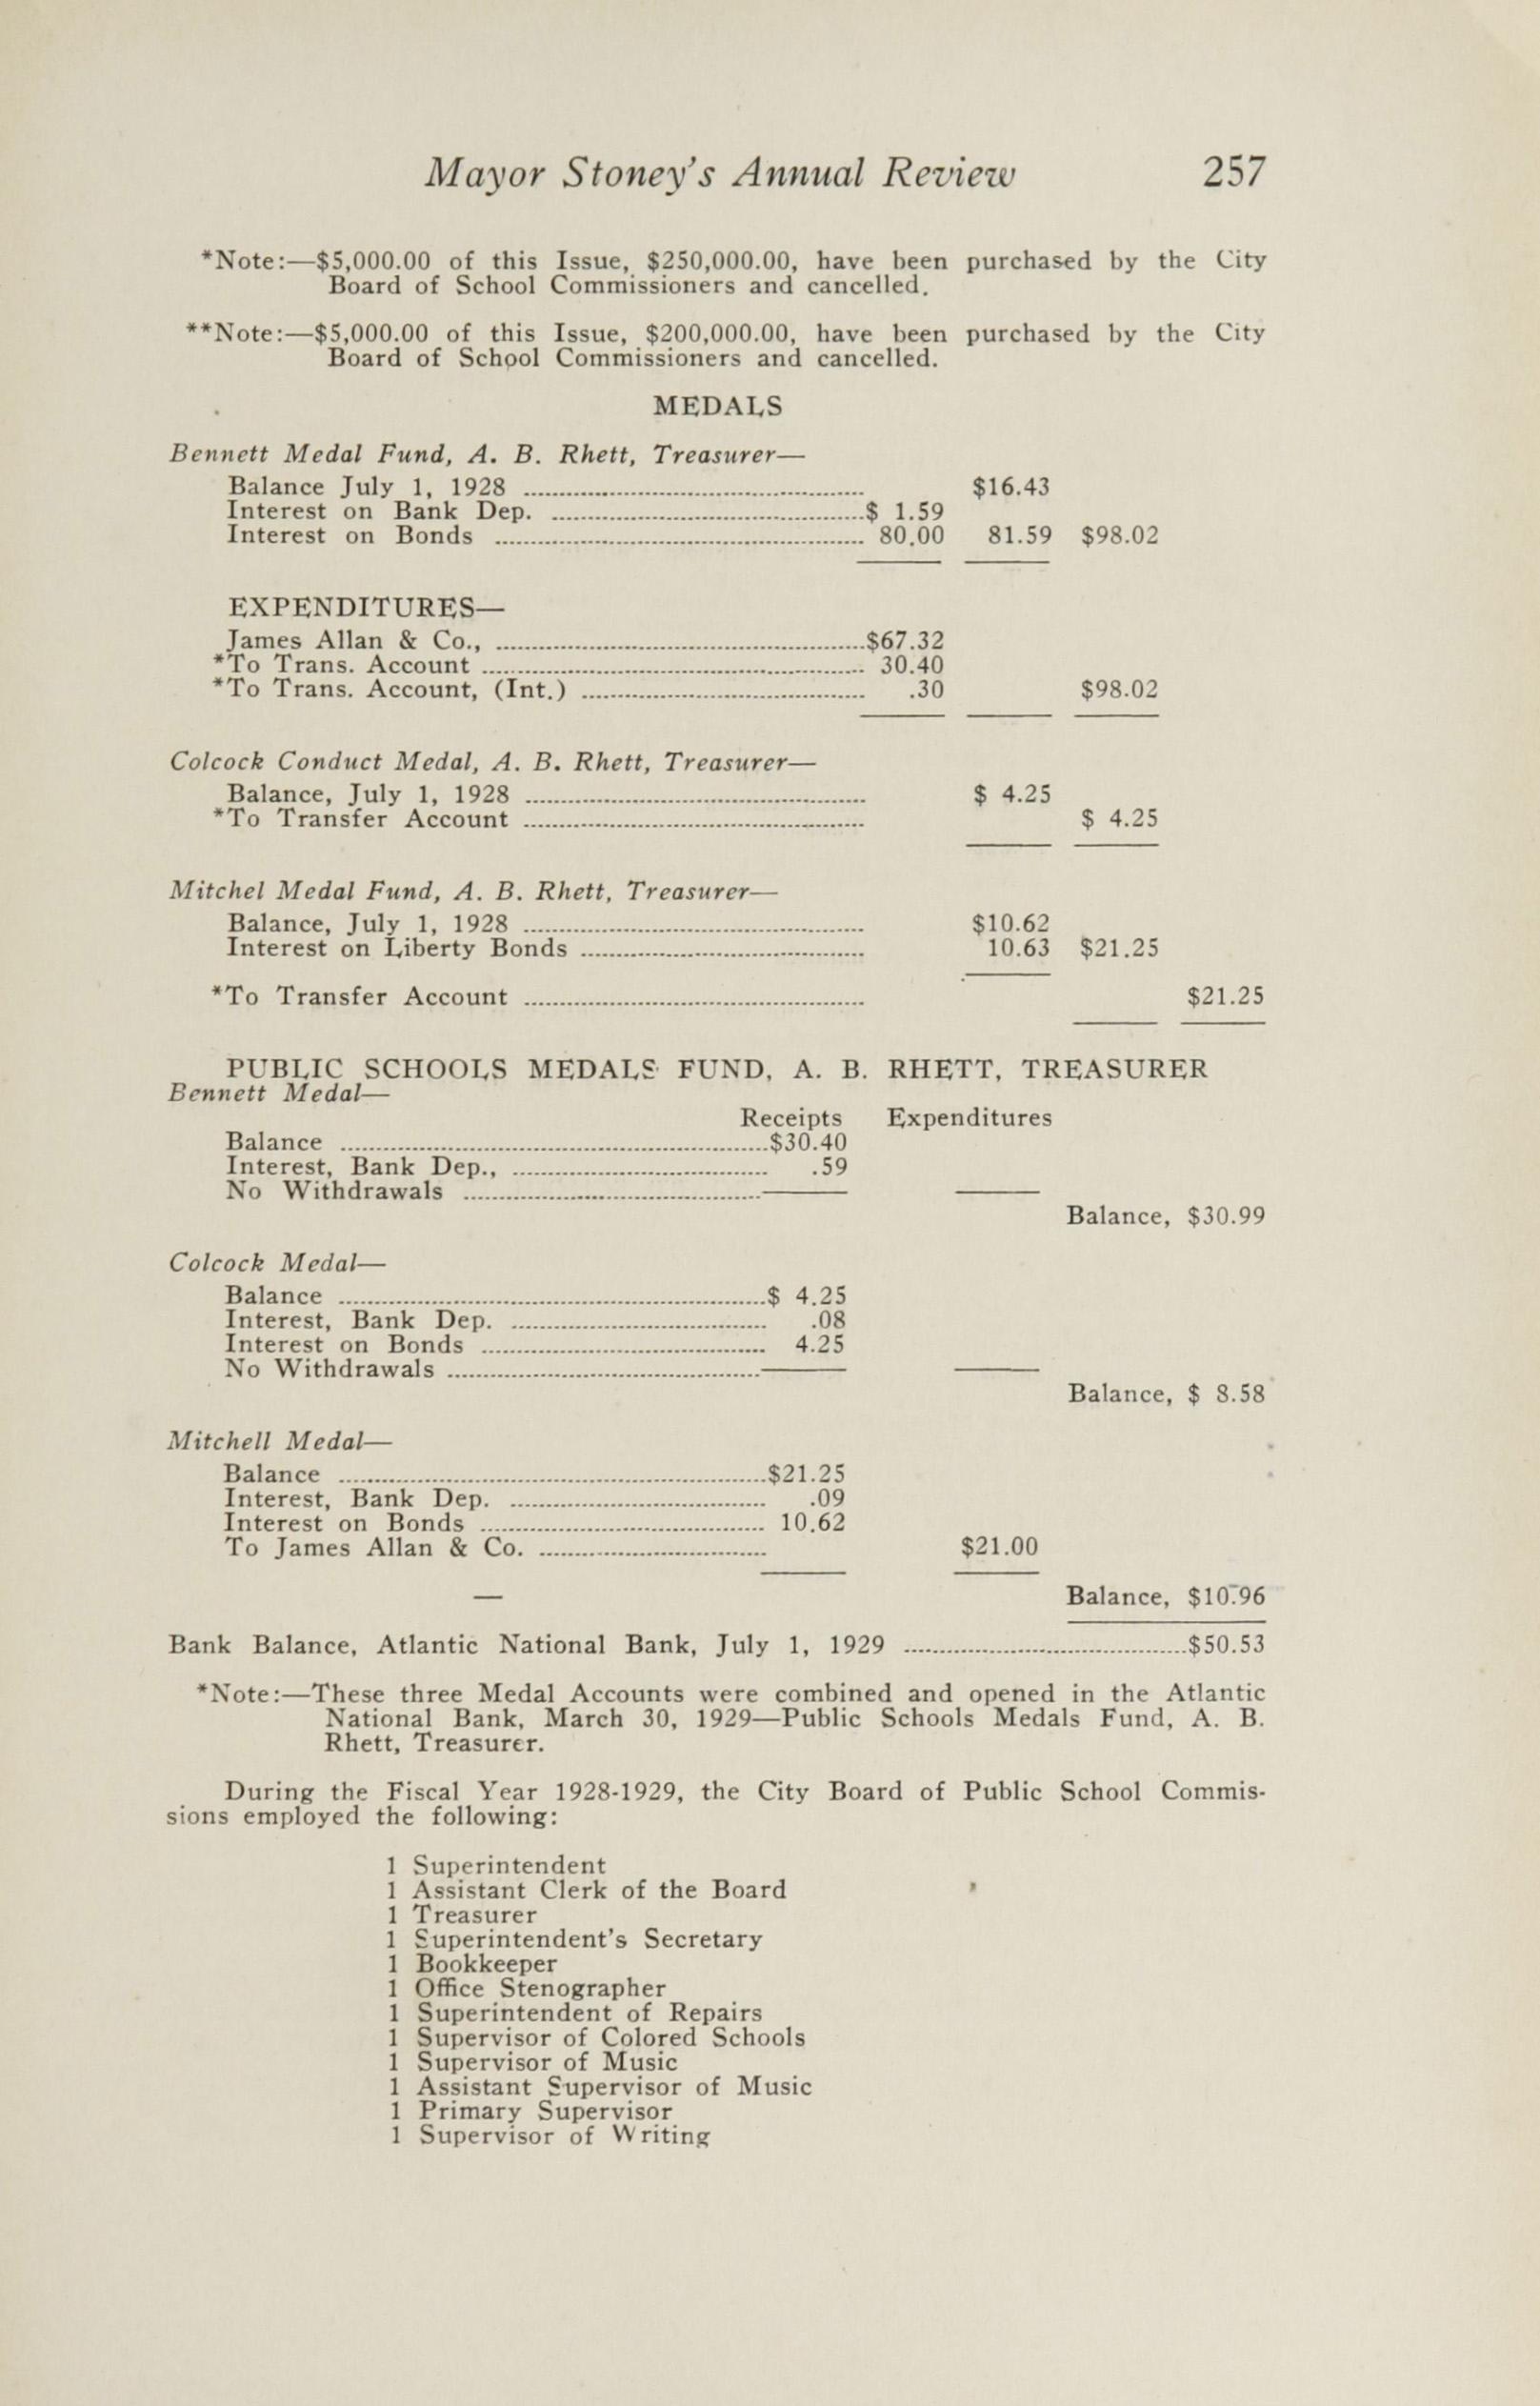 Charleston Yearbook, 1929, page 257